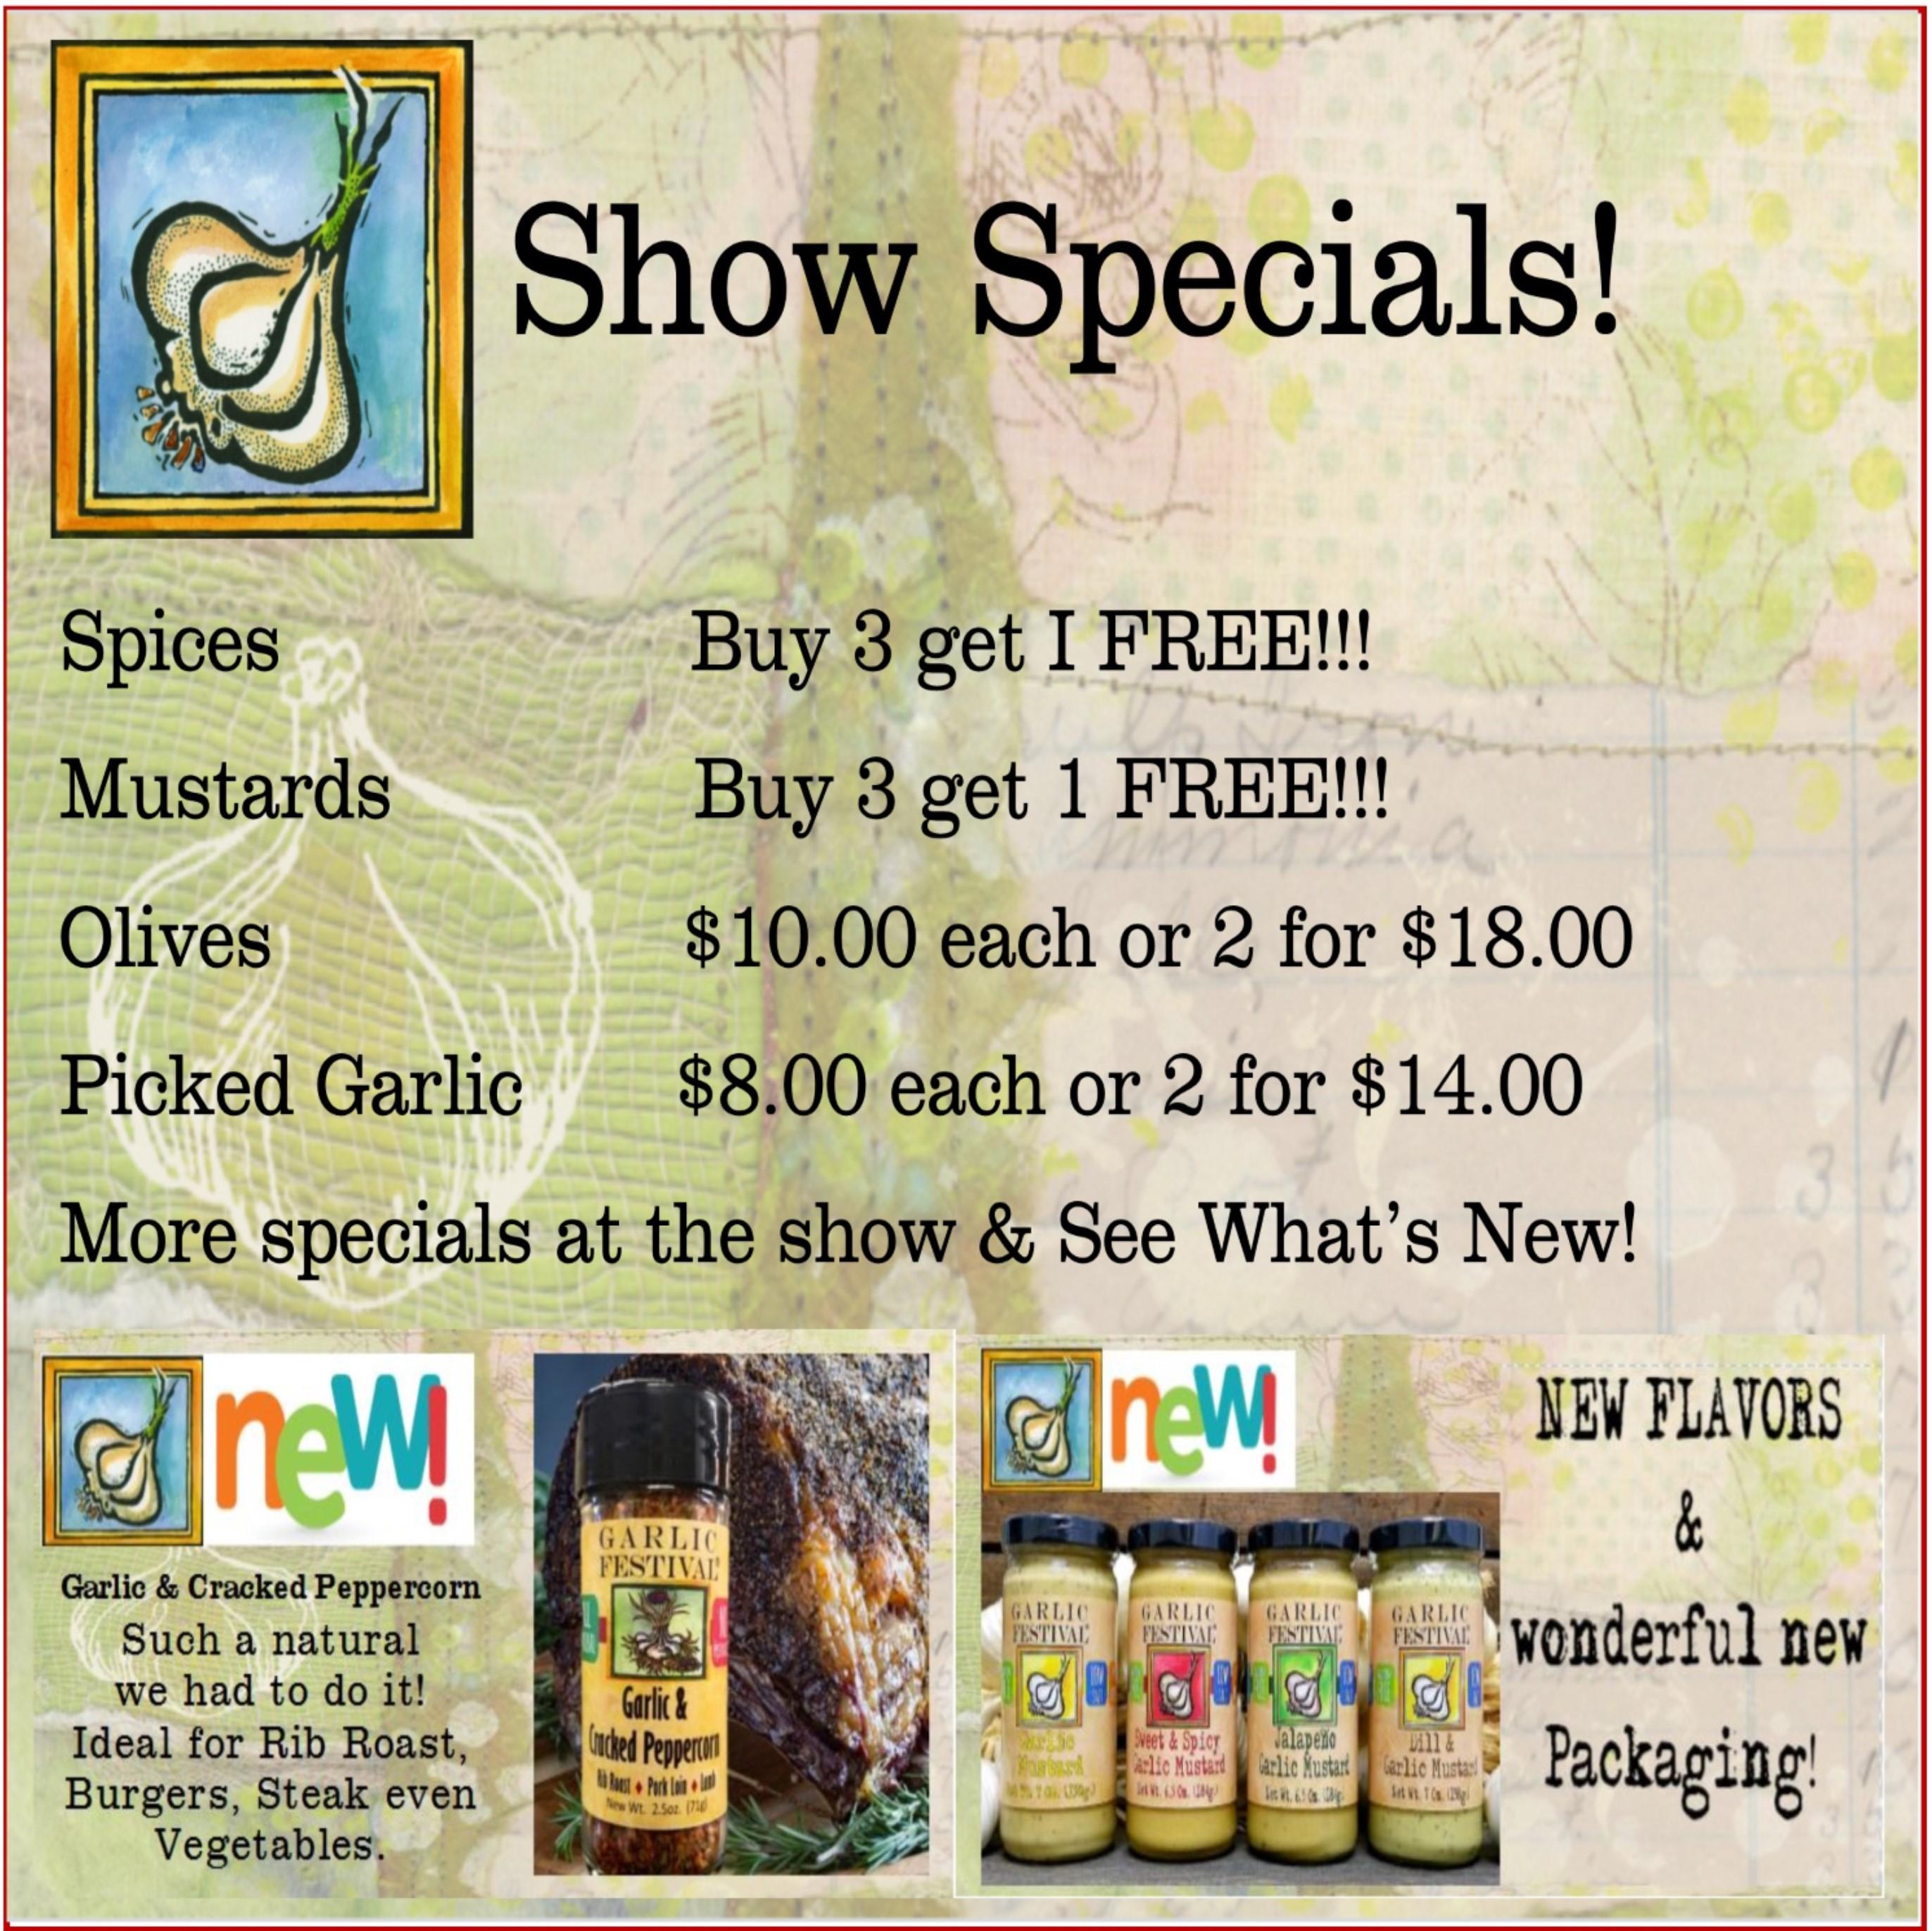 Gilroy garlic festival discount coupons